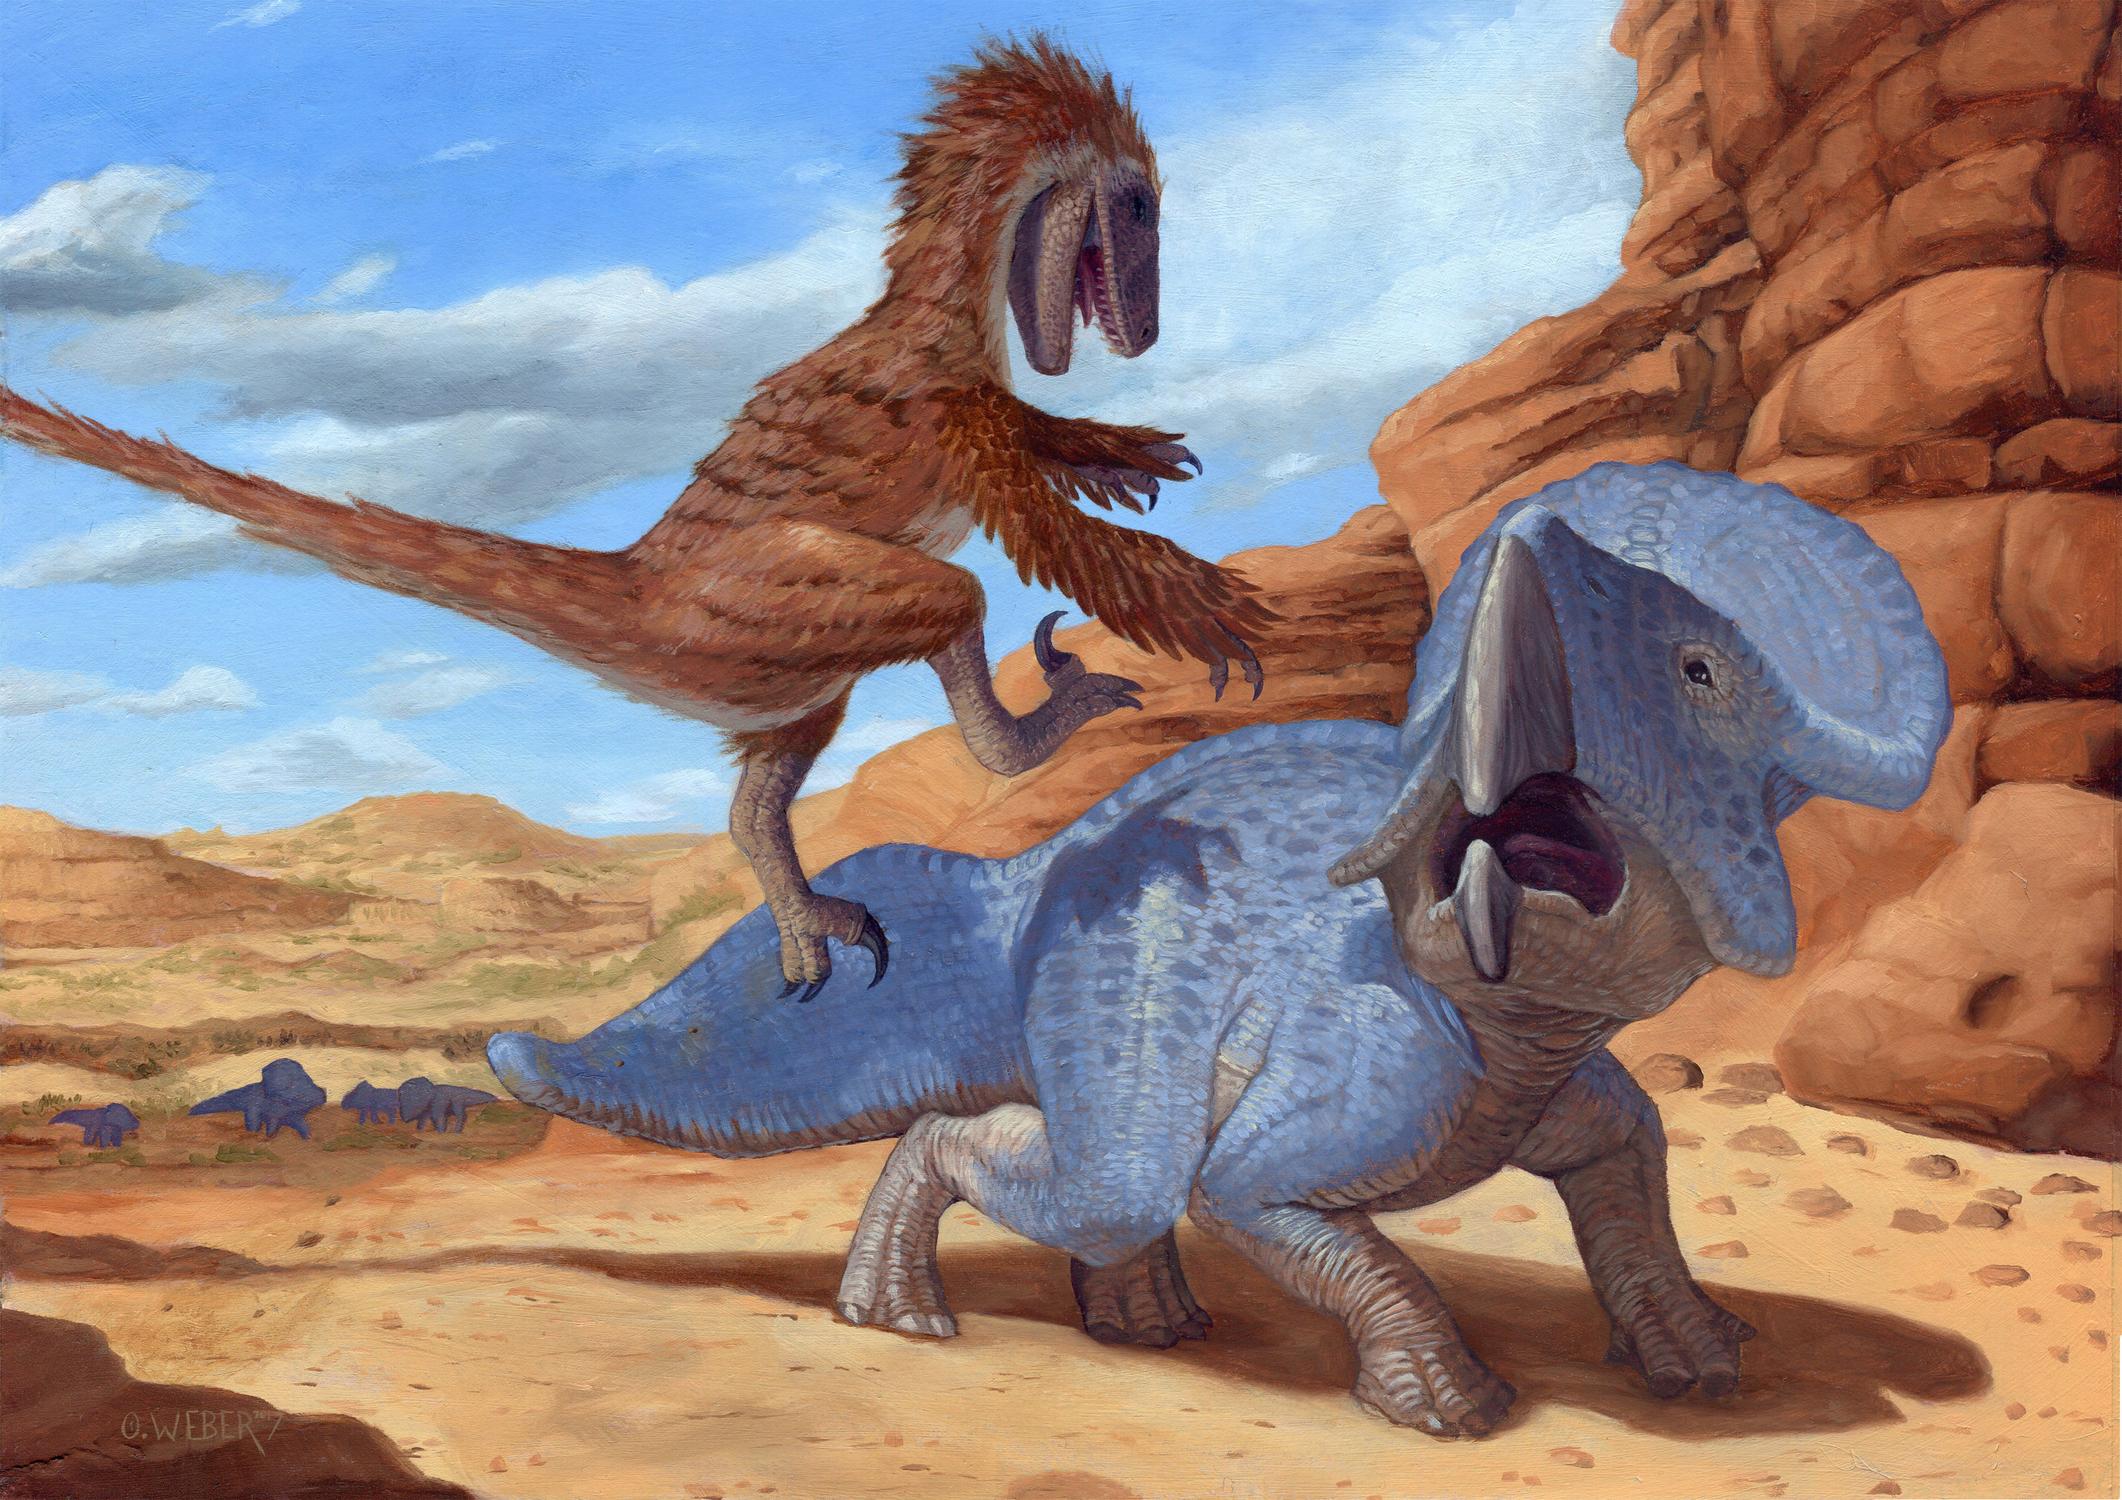 Fighting Dinosaurs Artwork by Owen Weber